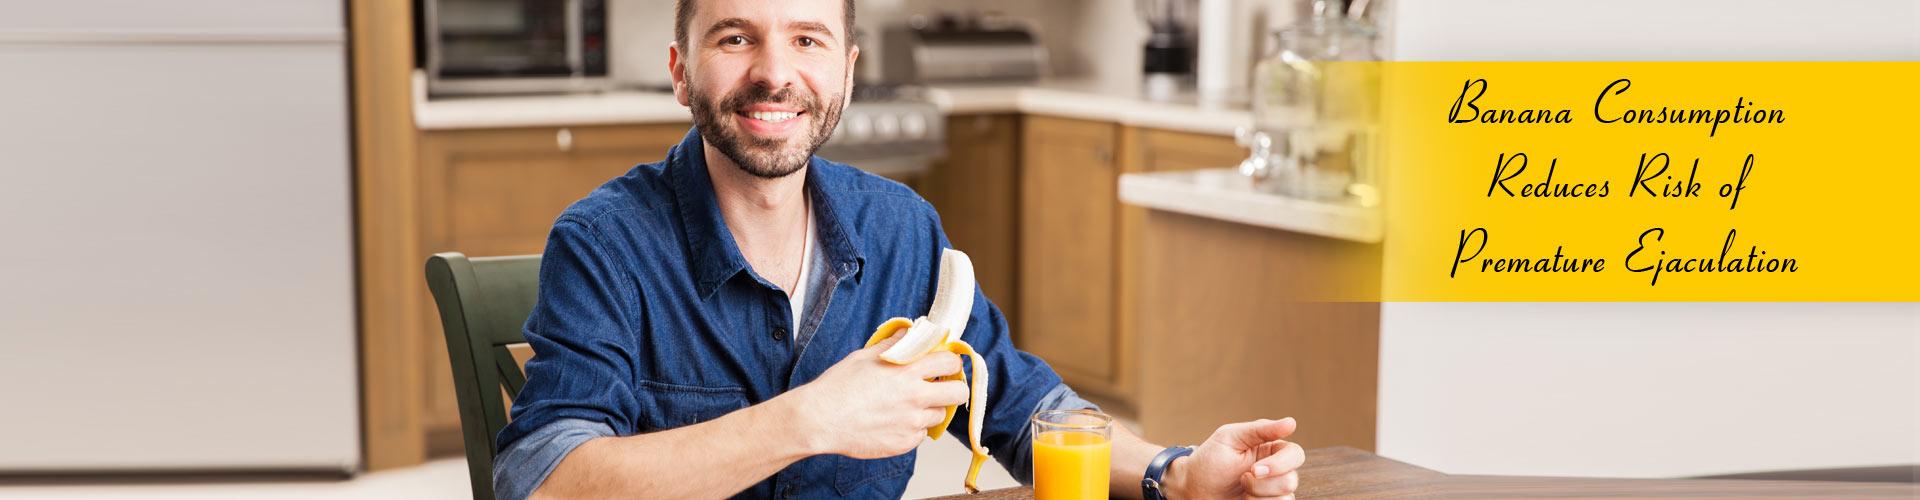 Top 10 Foods that Help Prevent Premature Ejaculation - Slide Show